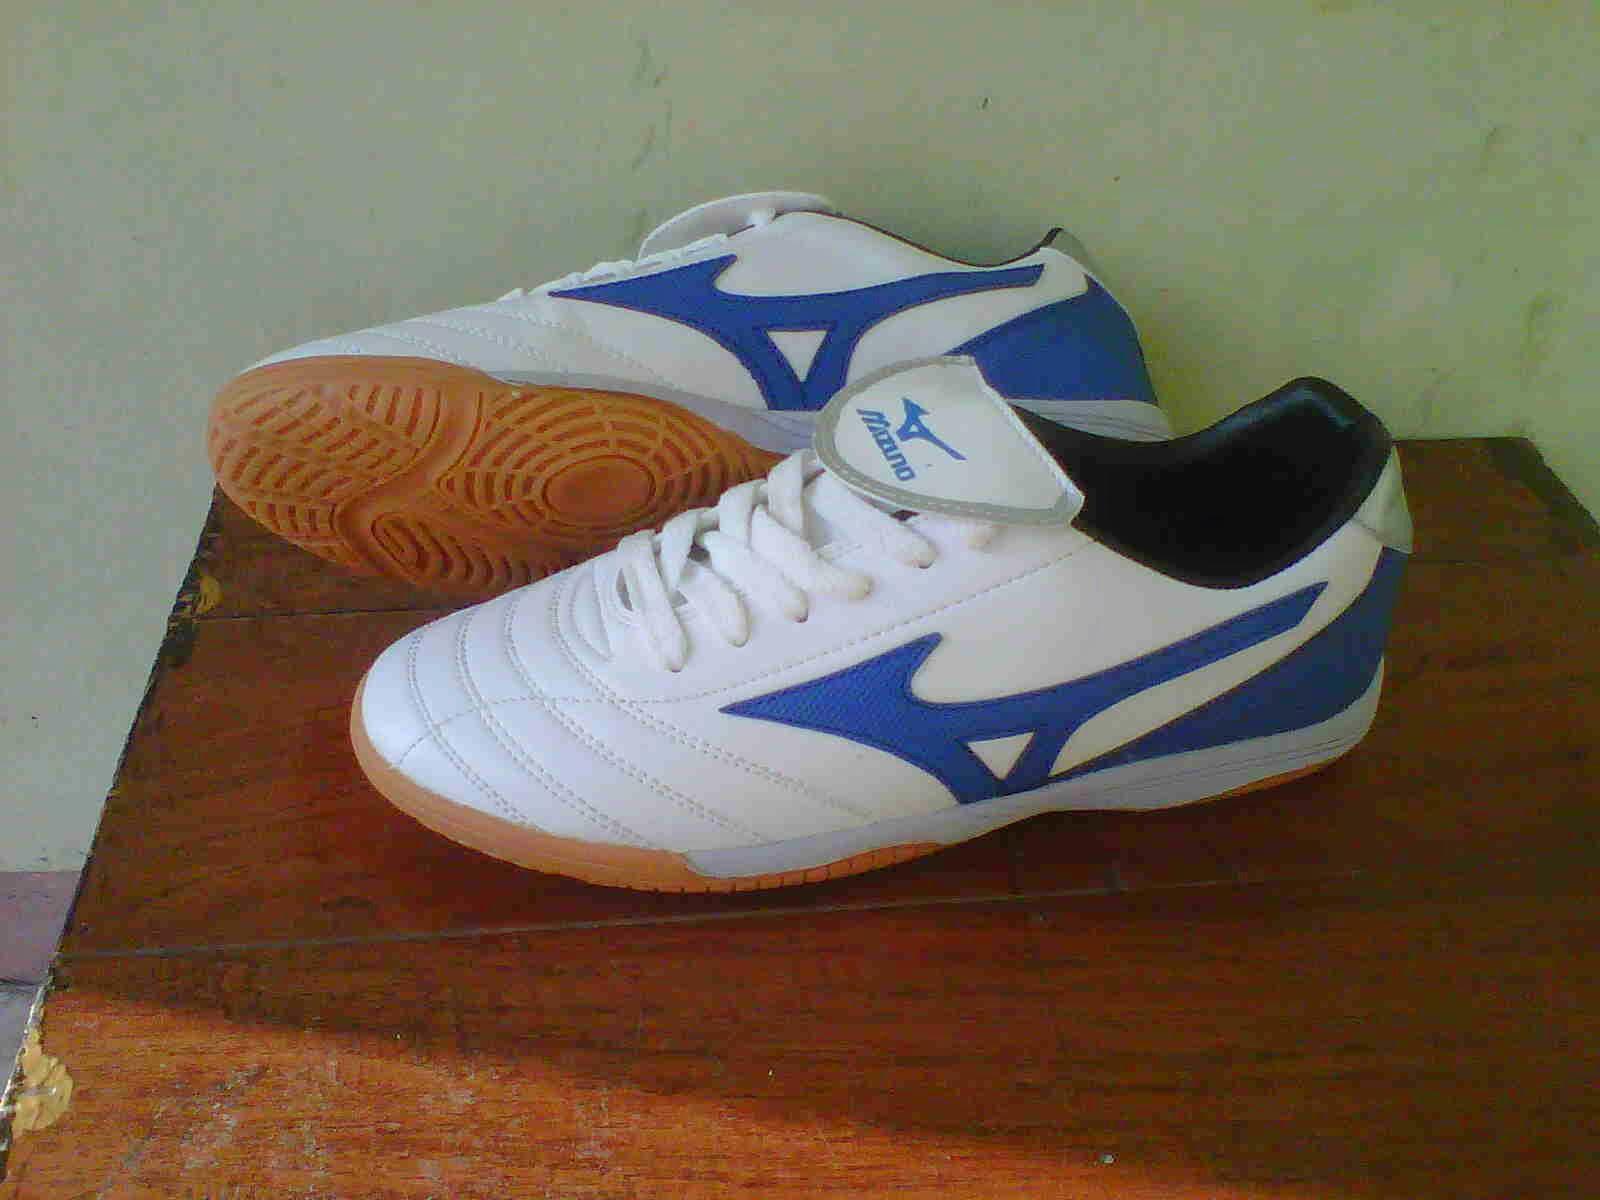 Grosir Sepatu Futsal Murah Berkualitas Agustus 2014 Mizuno  Ber Kualitas Putih Biru